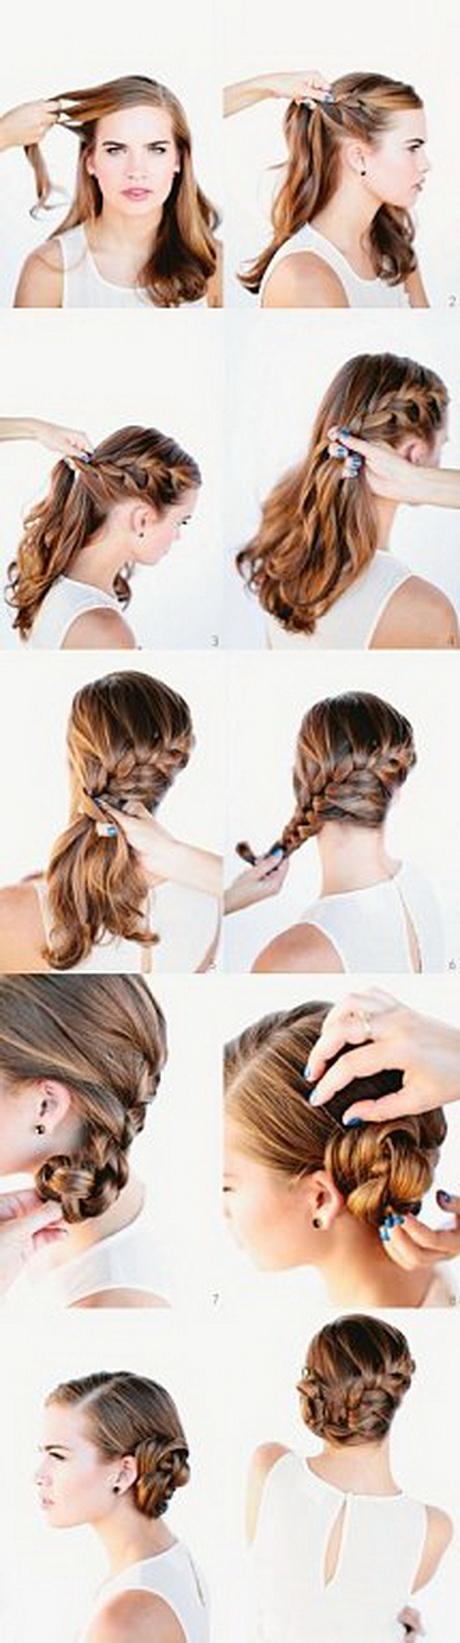 Ideas de peinados sencillos - Ideas de peinados ...